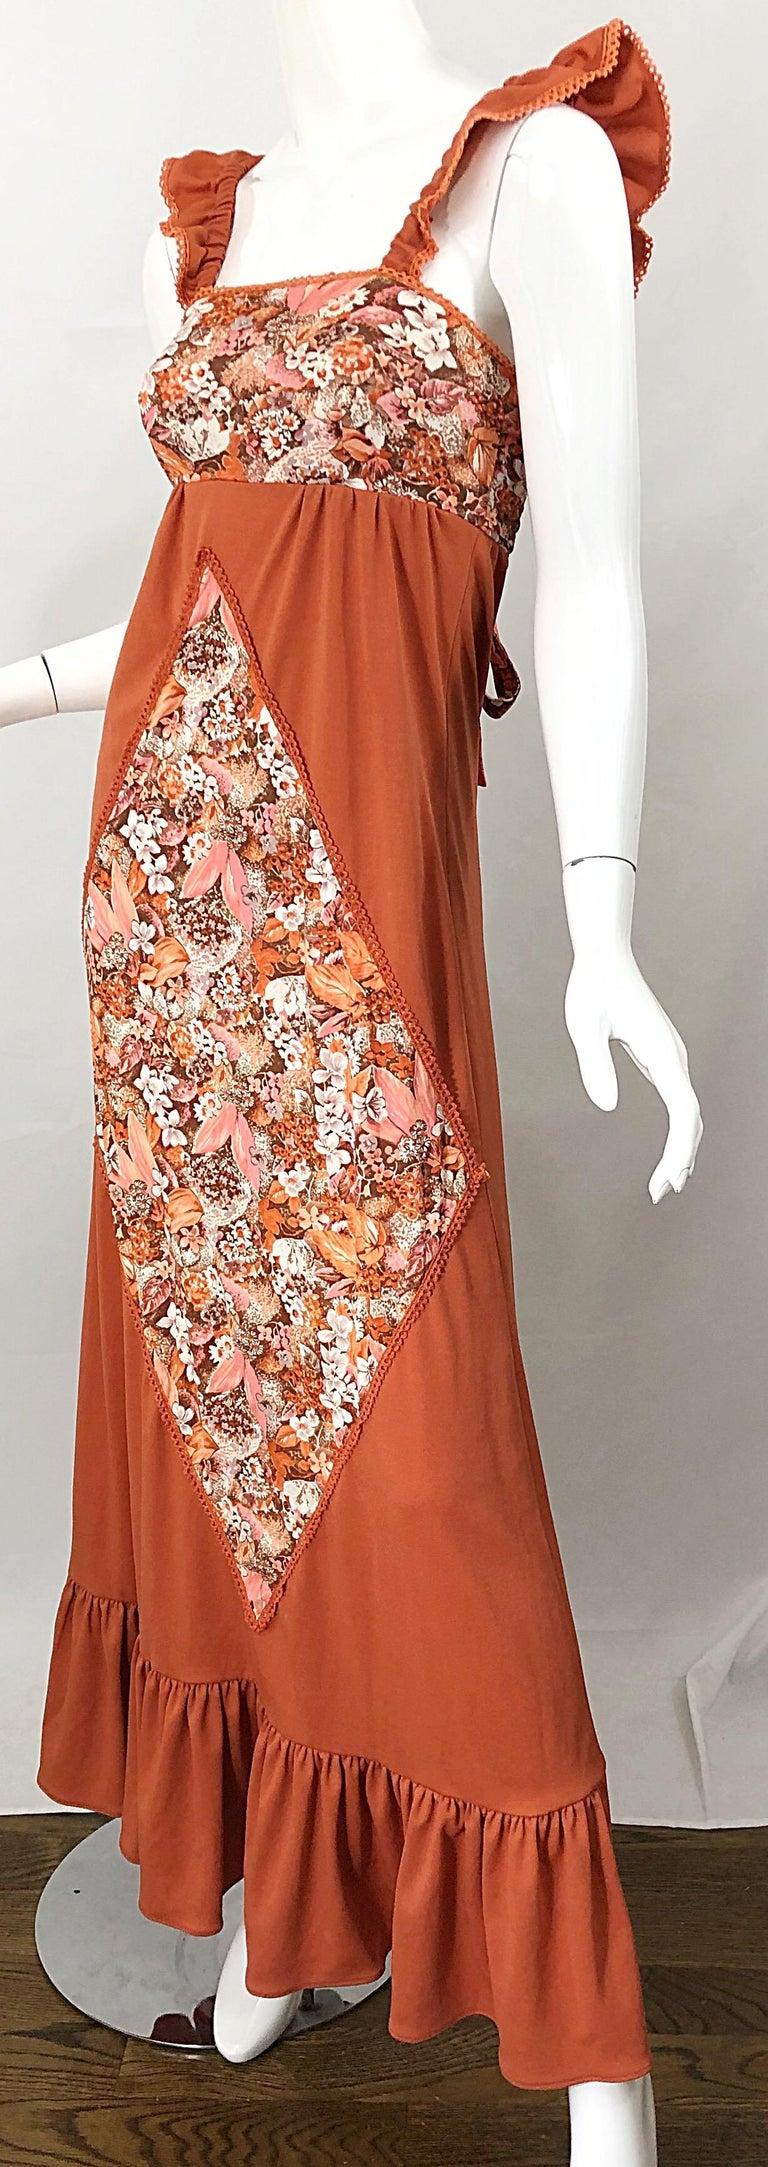 1970s Burnt Orange Patchwork Flowers Boho Vintage 70s Jersey Autumnal Maxi Dress For Sale 1